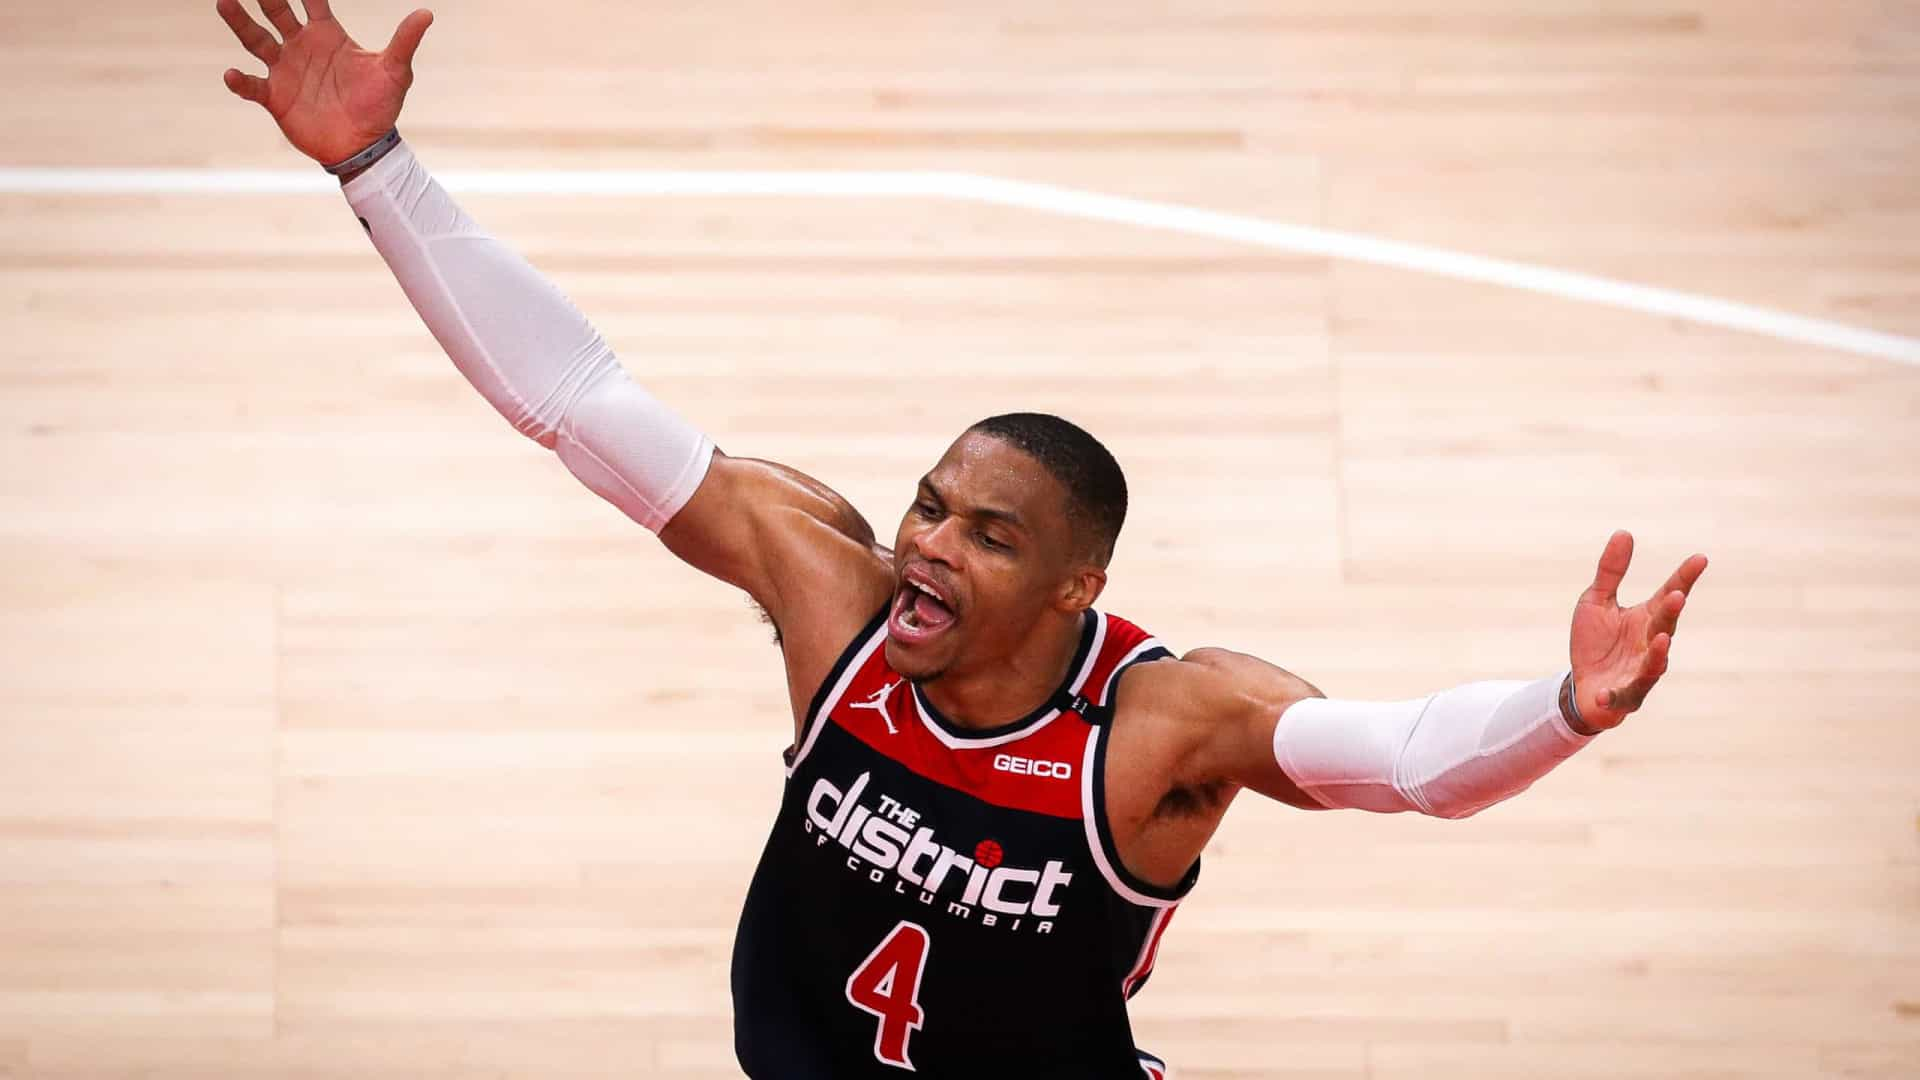 Westbrook ultrapassa Robertson e se torna atleta com mais 'triple-doubles' na NBA